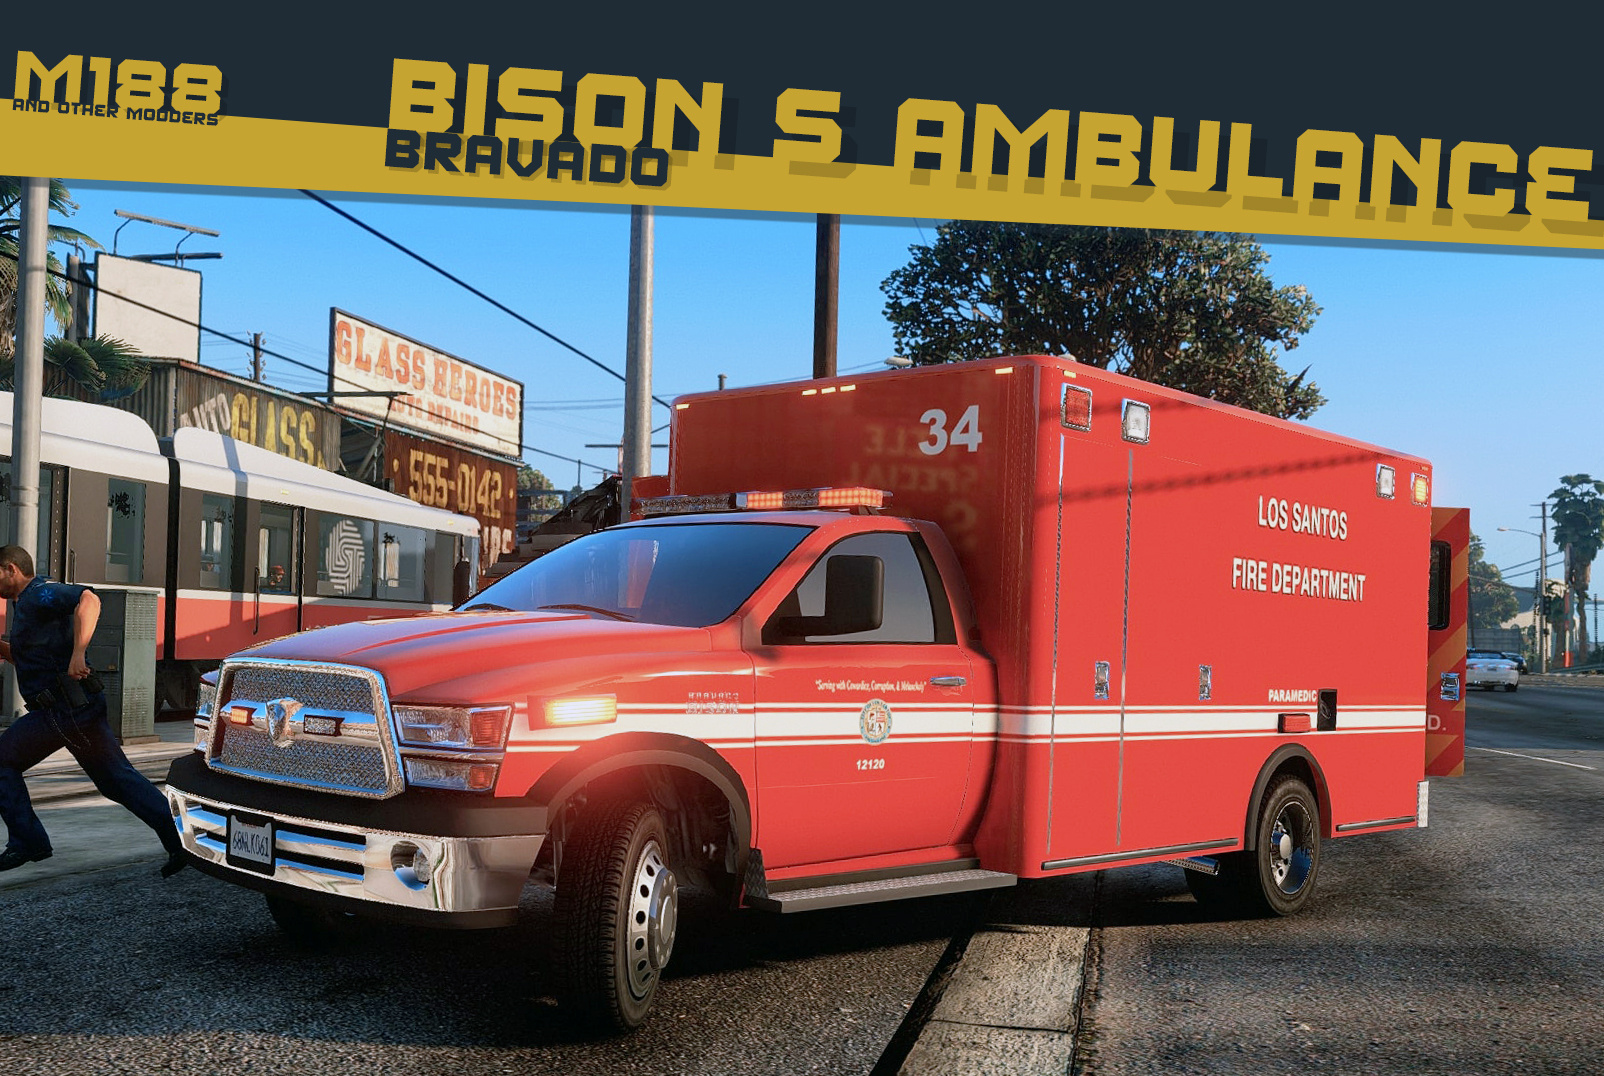 15cb54-Ambulance.jpg